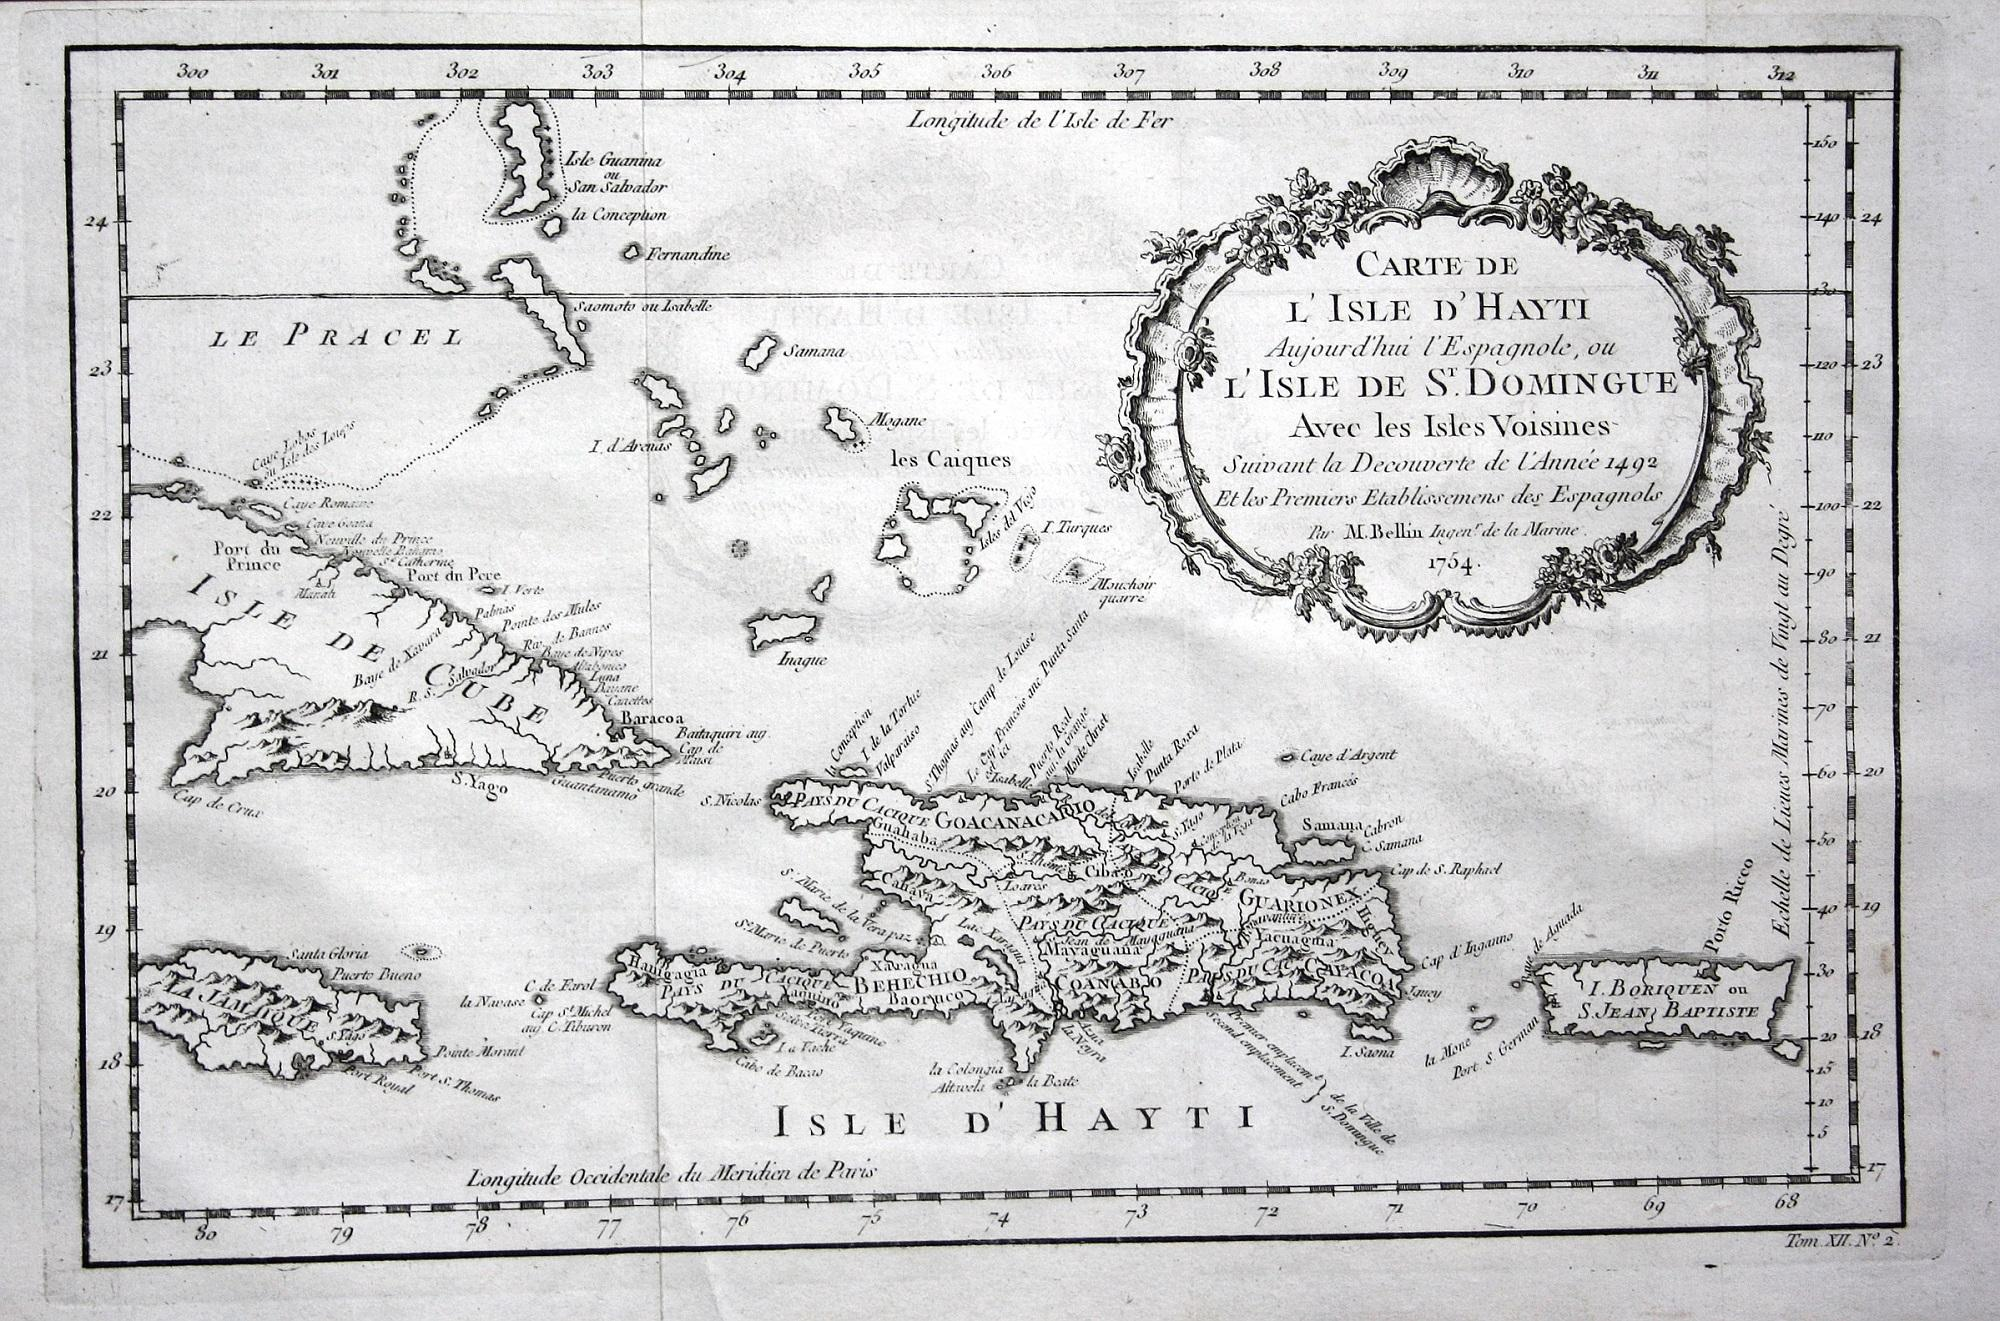 Haiti Karte.Carte De L Isle D Hayti Aujourd Hui